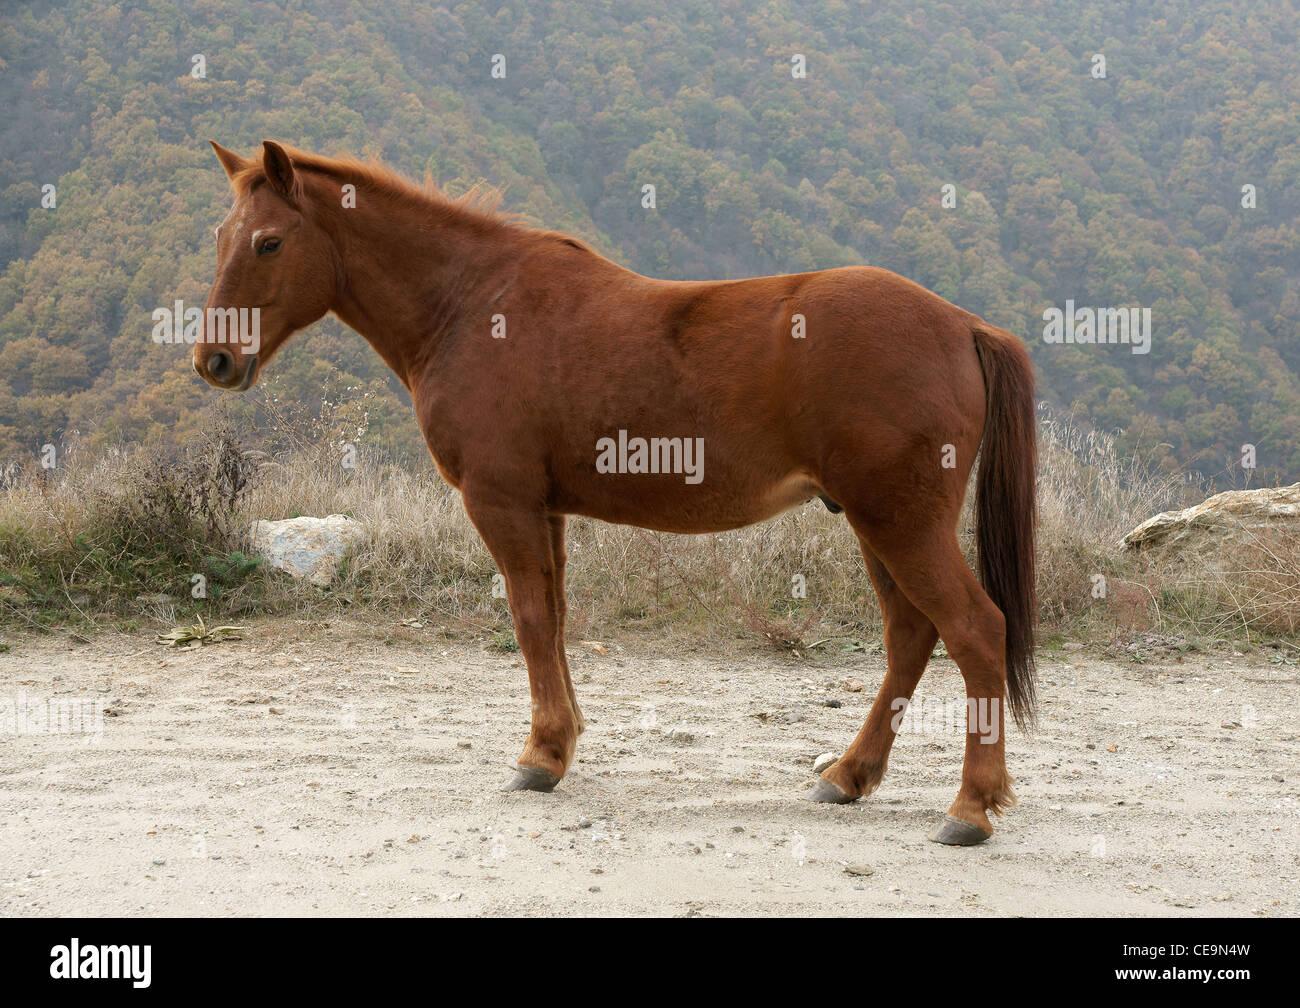 Horse - Stock Image